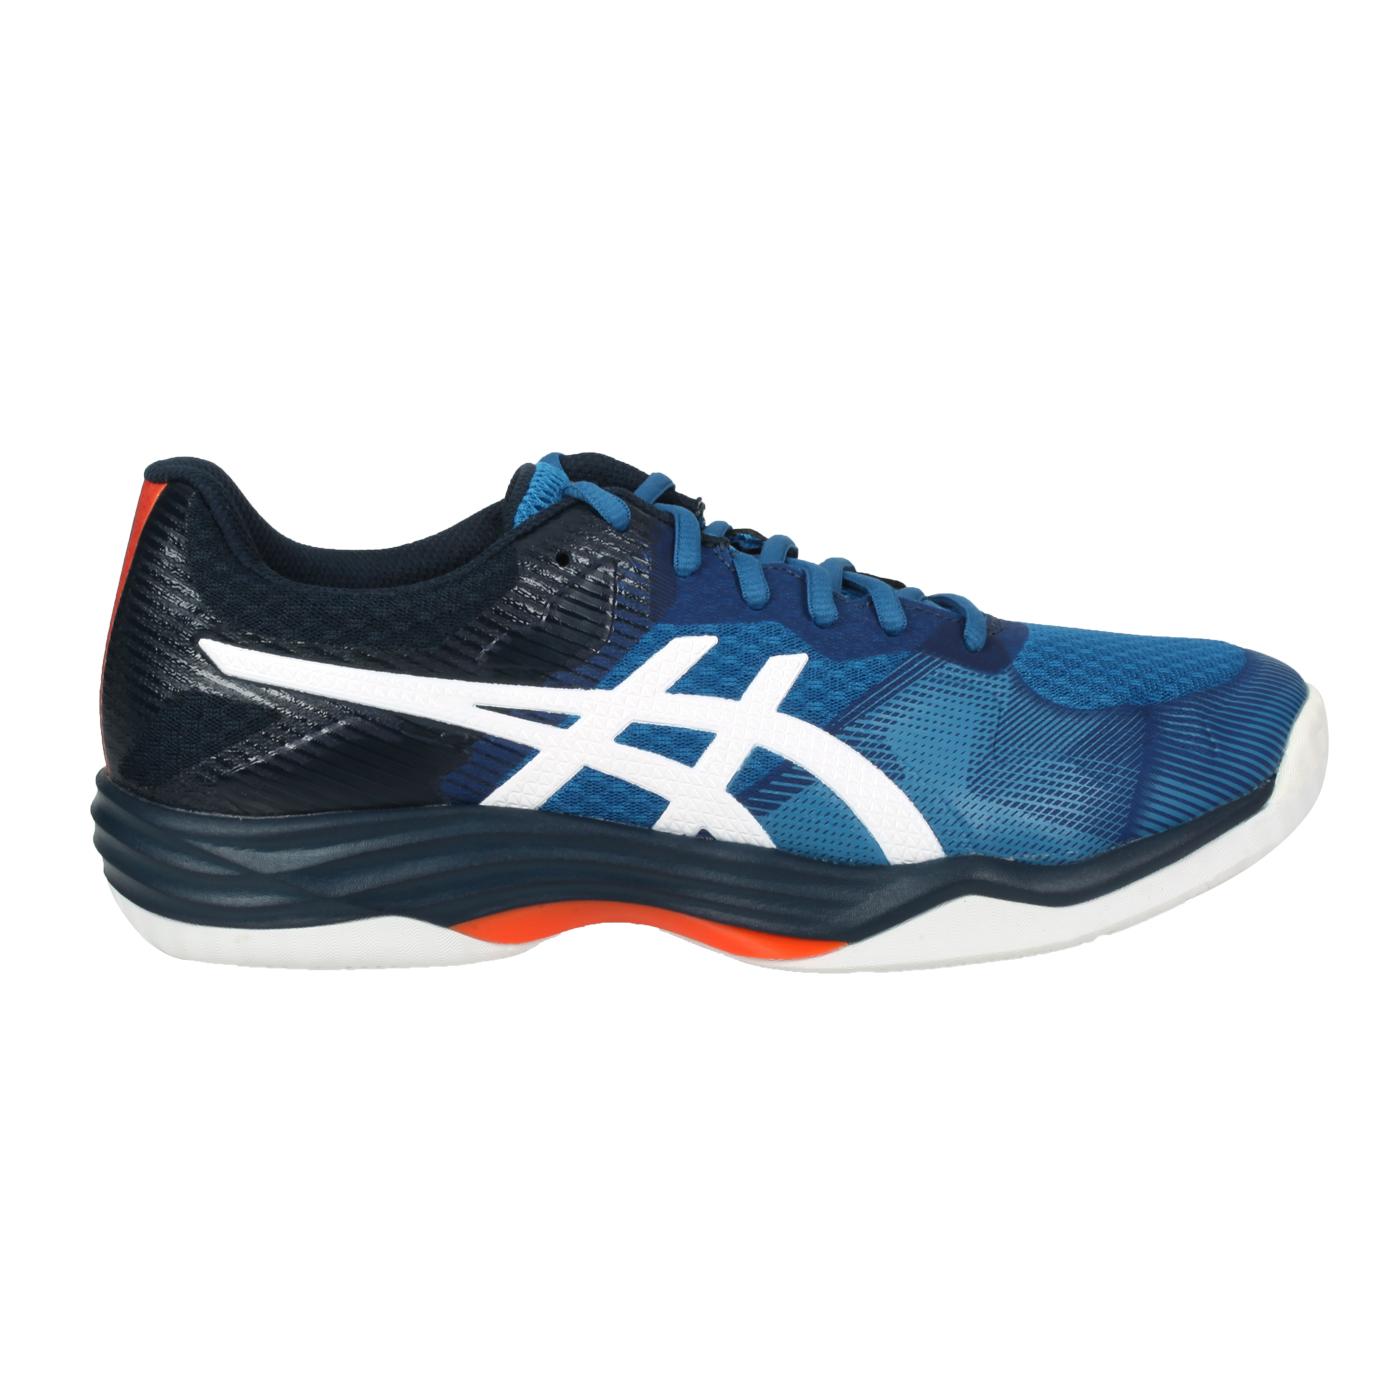 ASICS 男款排羽球鞋  @GEL-TACTIC1071A031-402